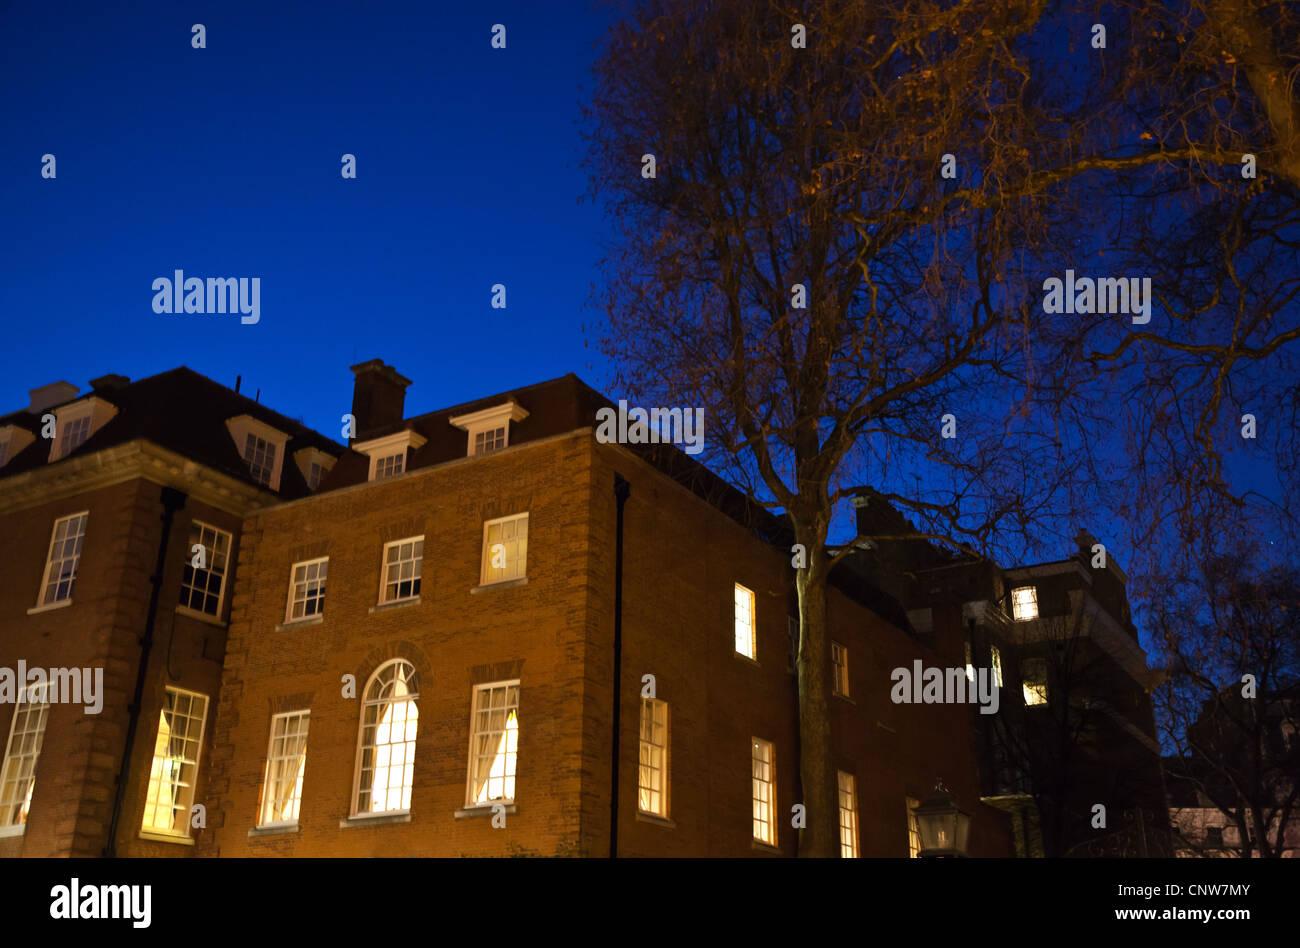 Europe England London, an house in Halkin street - Stock Image